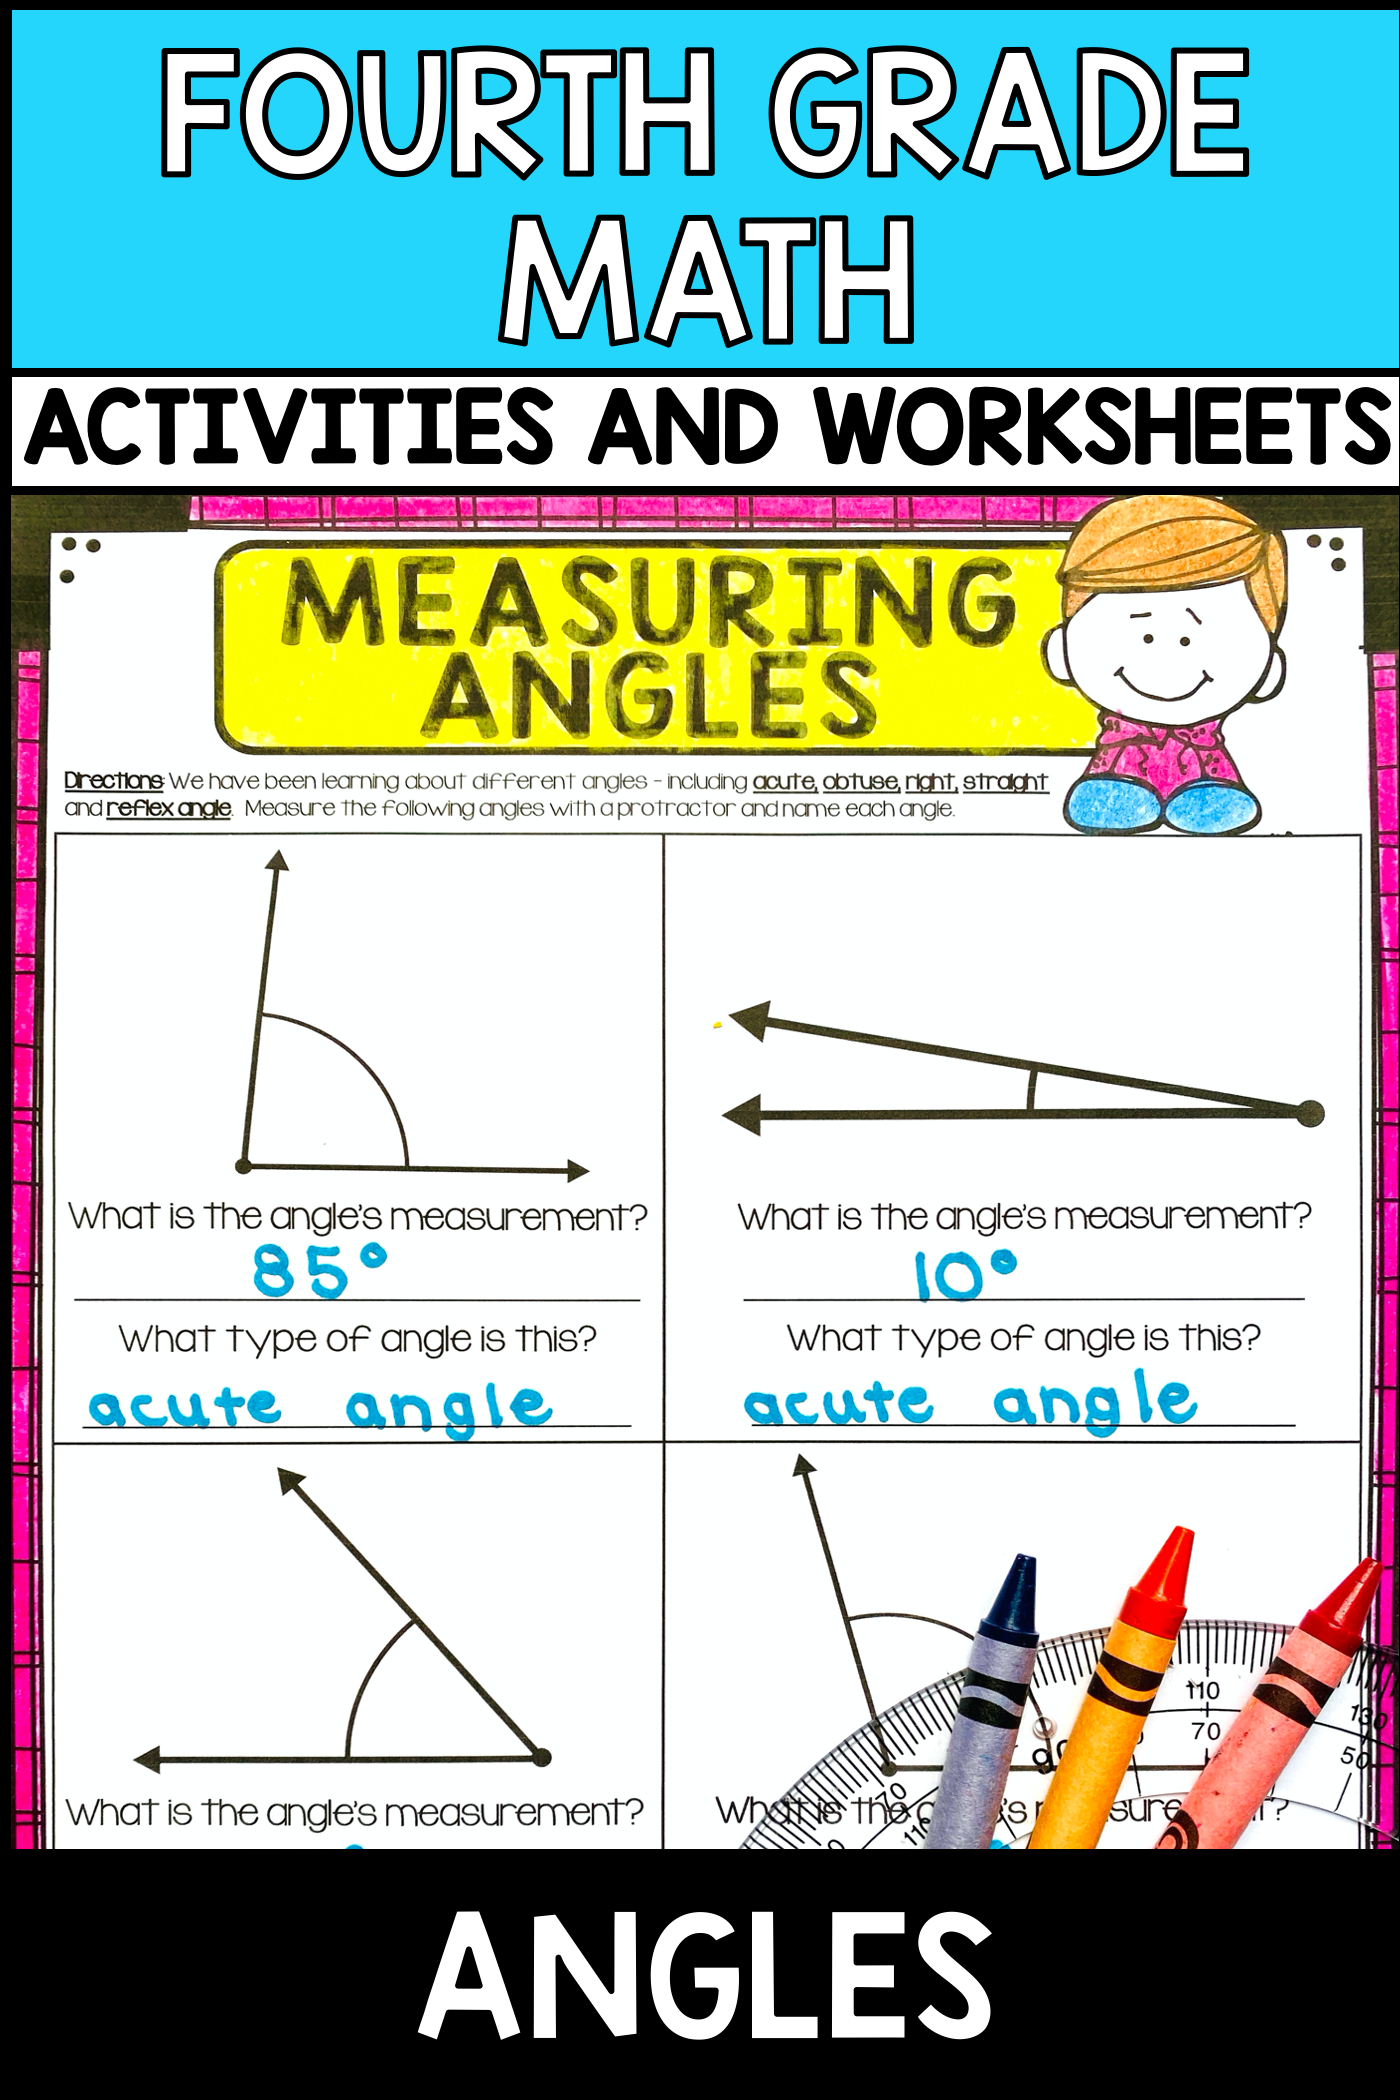 hight resolution of Angles   4th Grade   NO PREP   Measuring angles